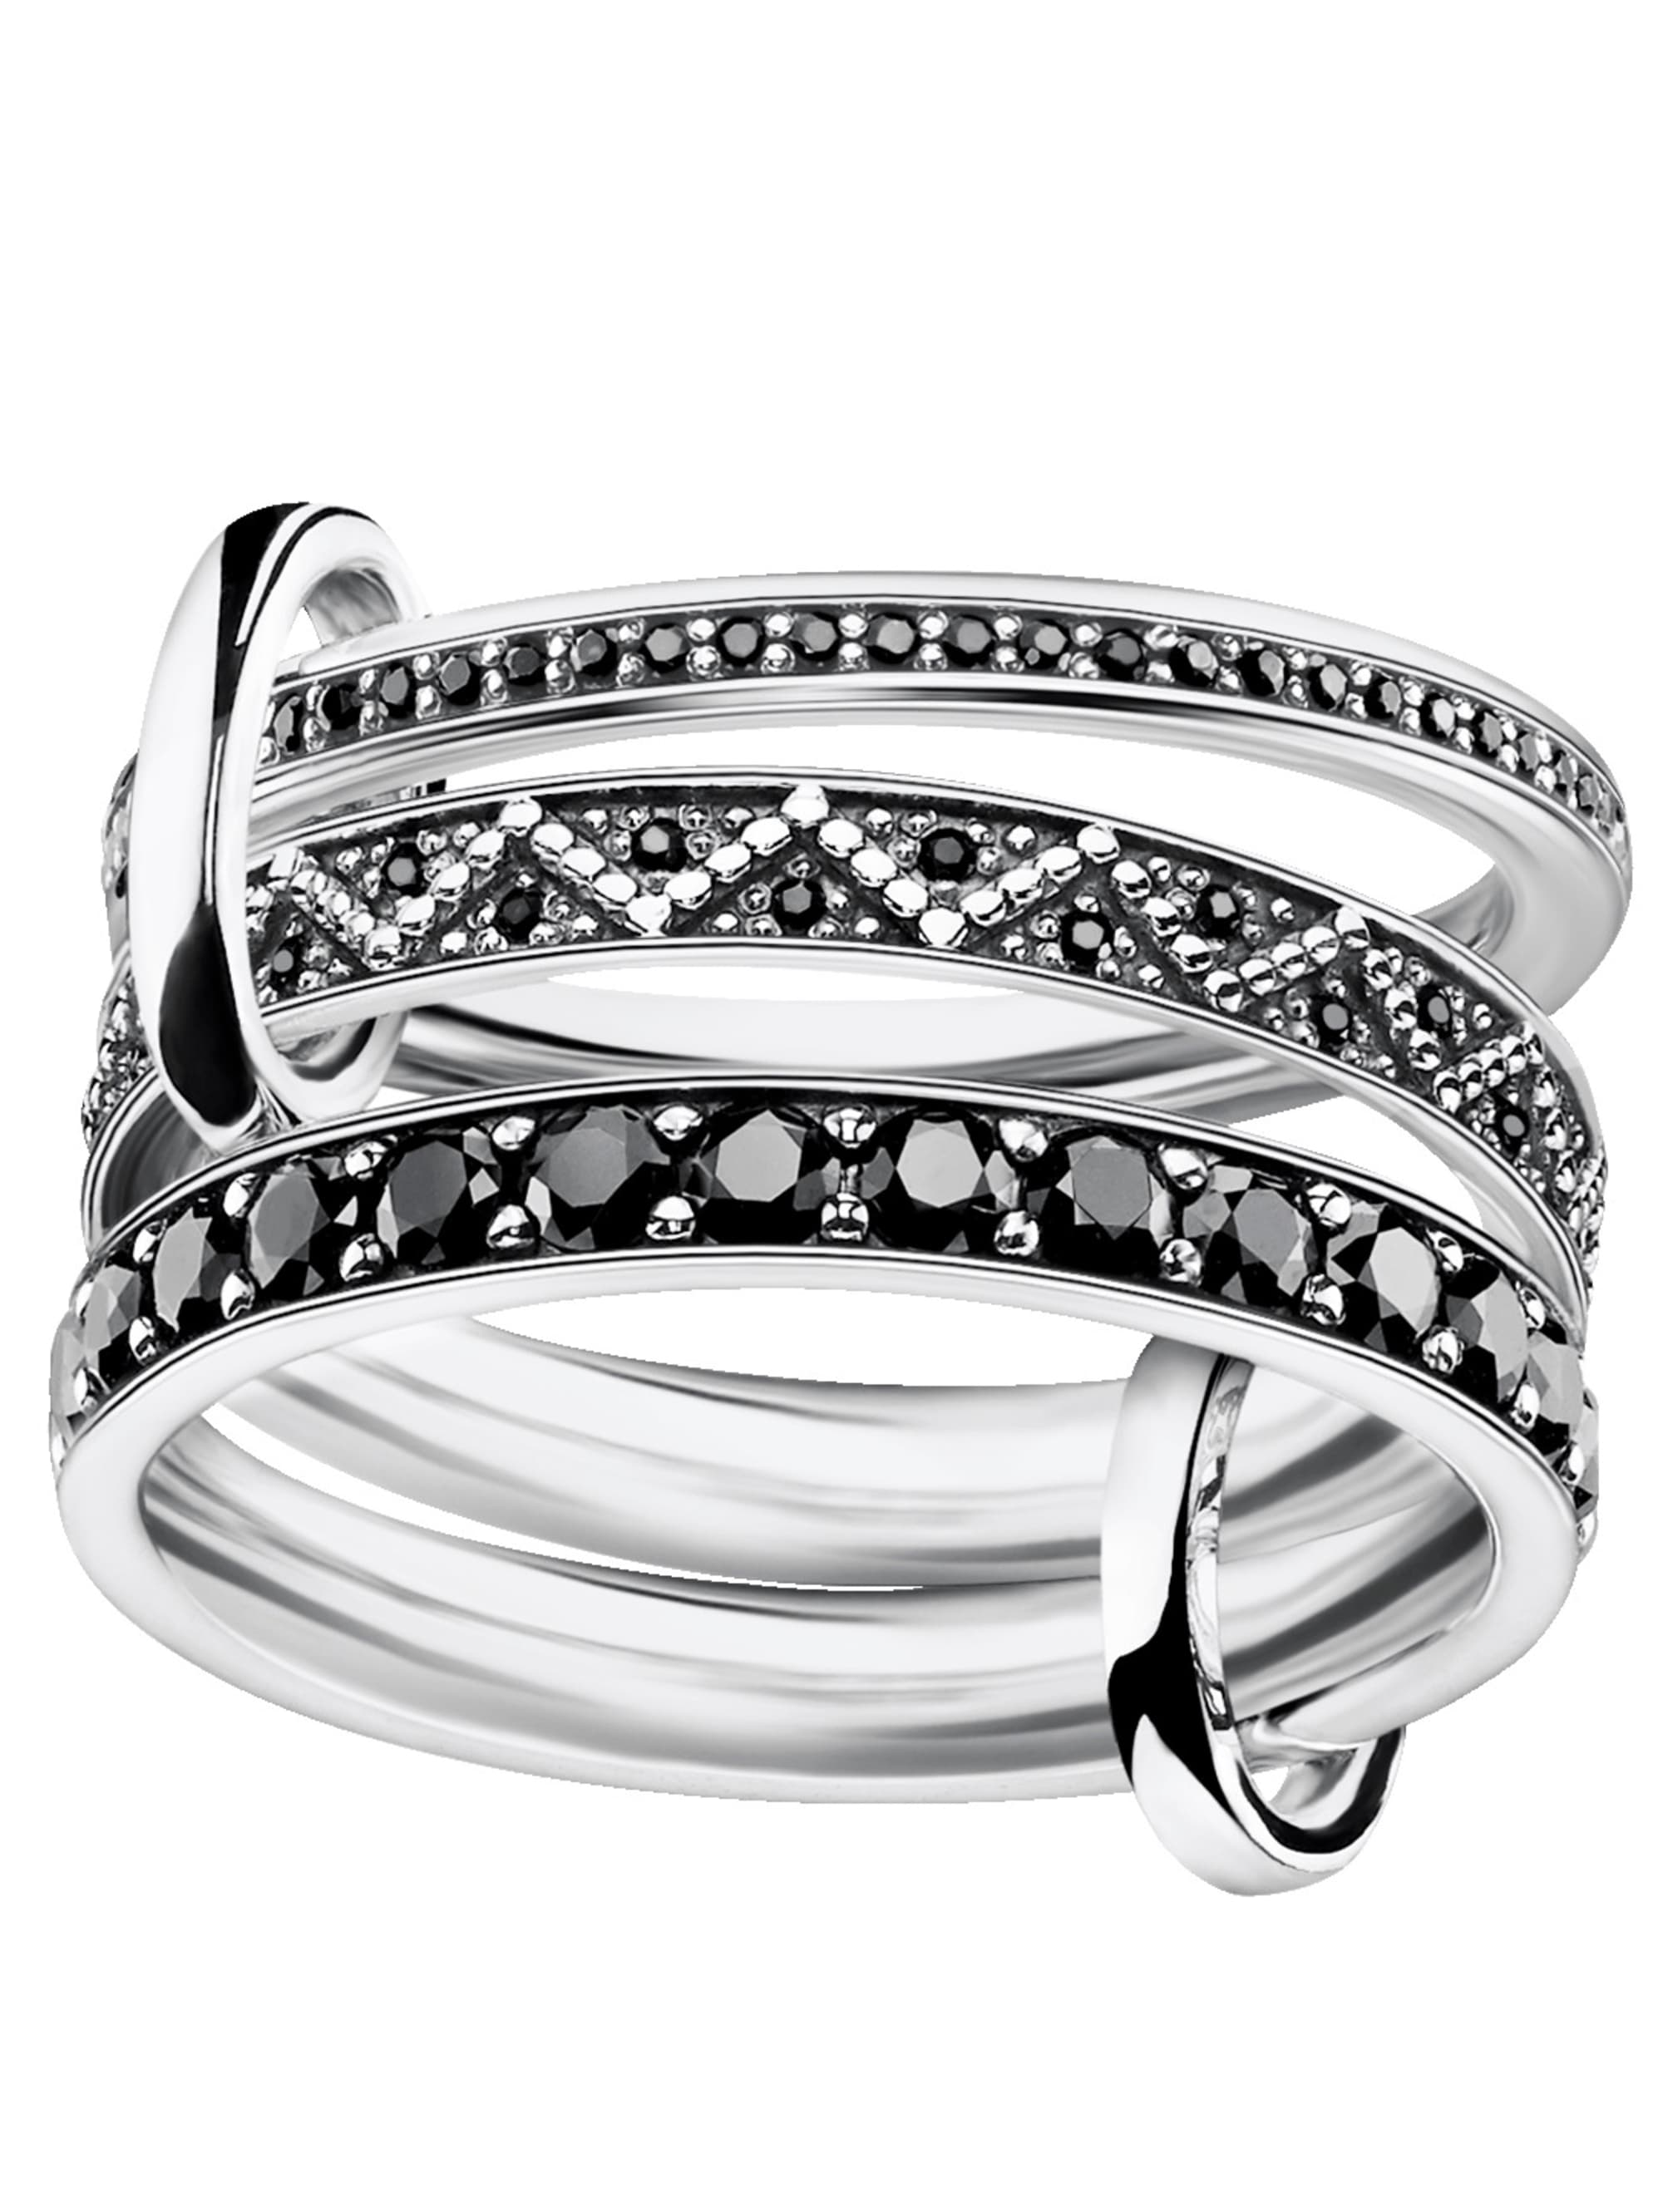 Thomas Sabo Triple Ring in Silber 925 TRIPLE RING TR2200-643-11 5OzvS